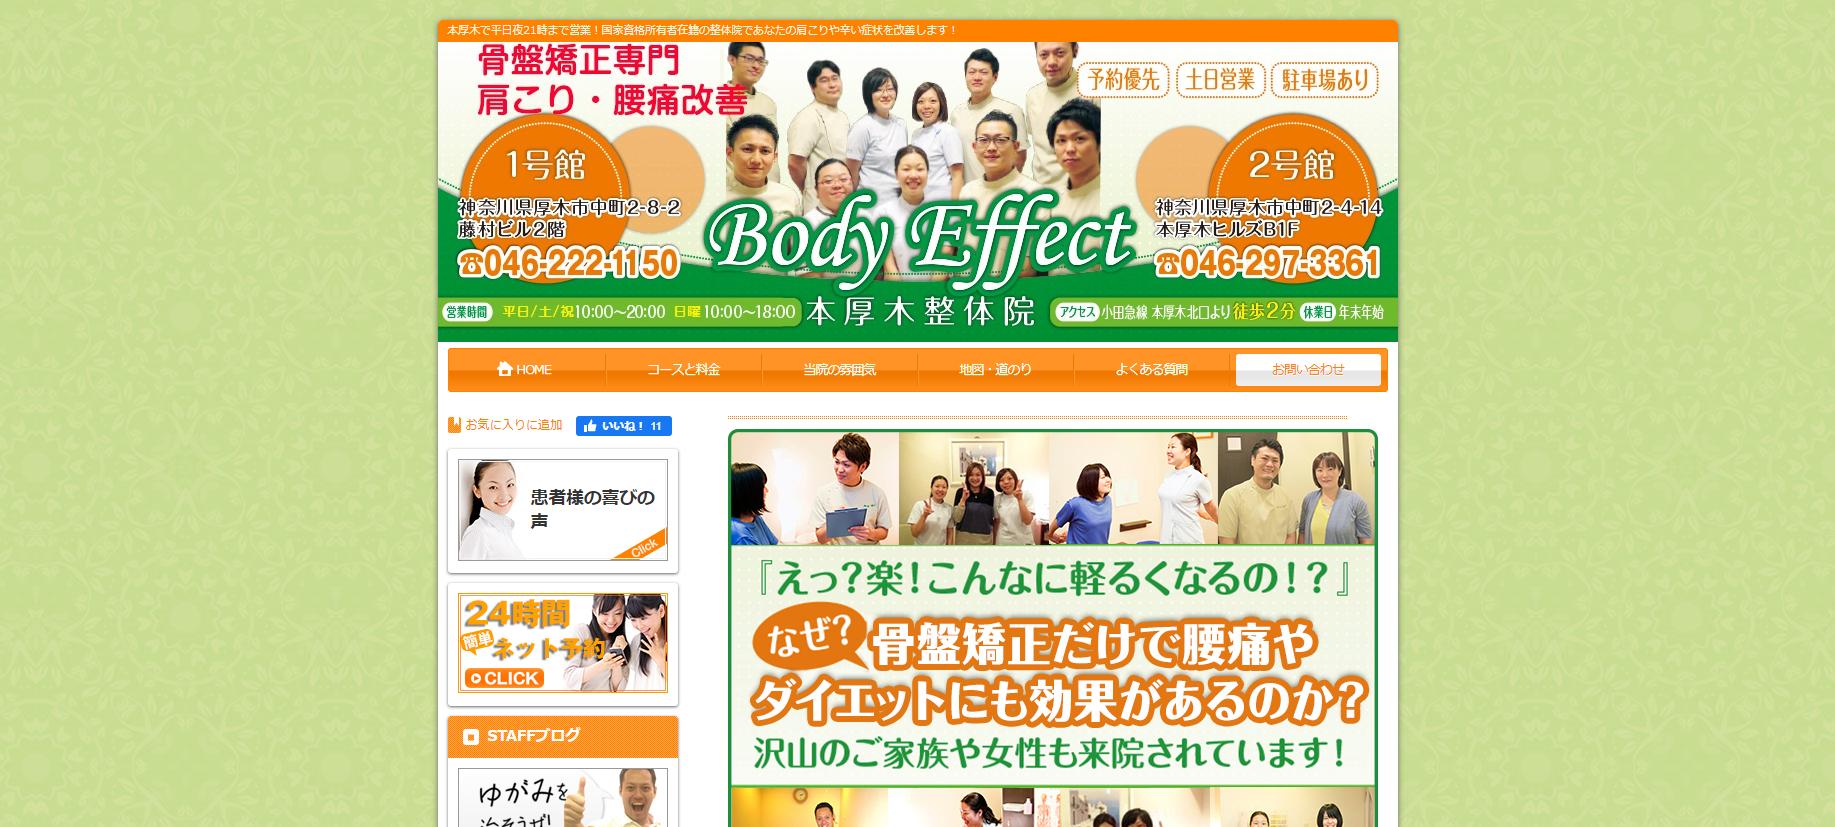 Body Effect 本厚木整体院のサムネイル